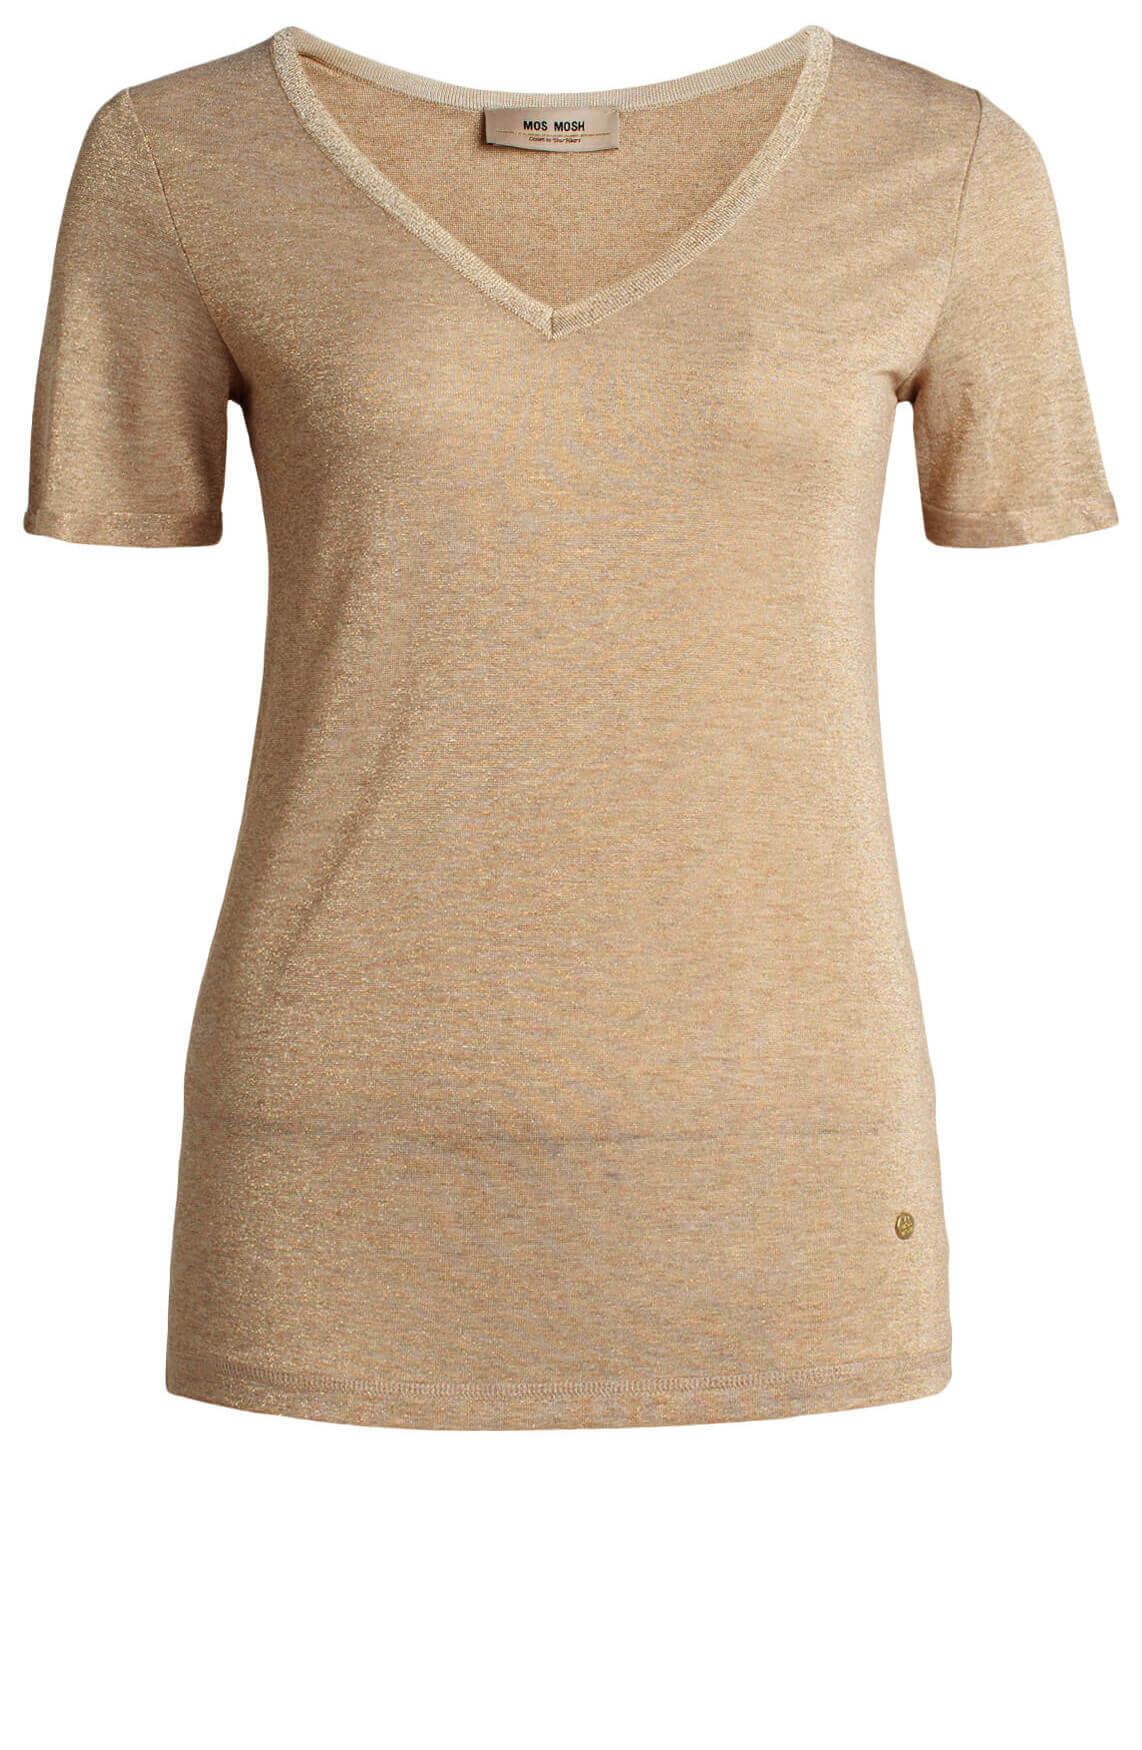 Mos Mosh Dames Casio glitter shirt goud